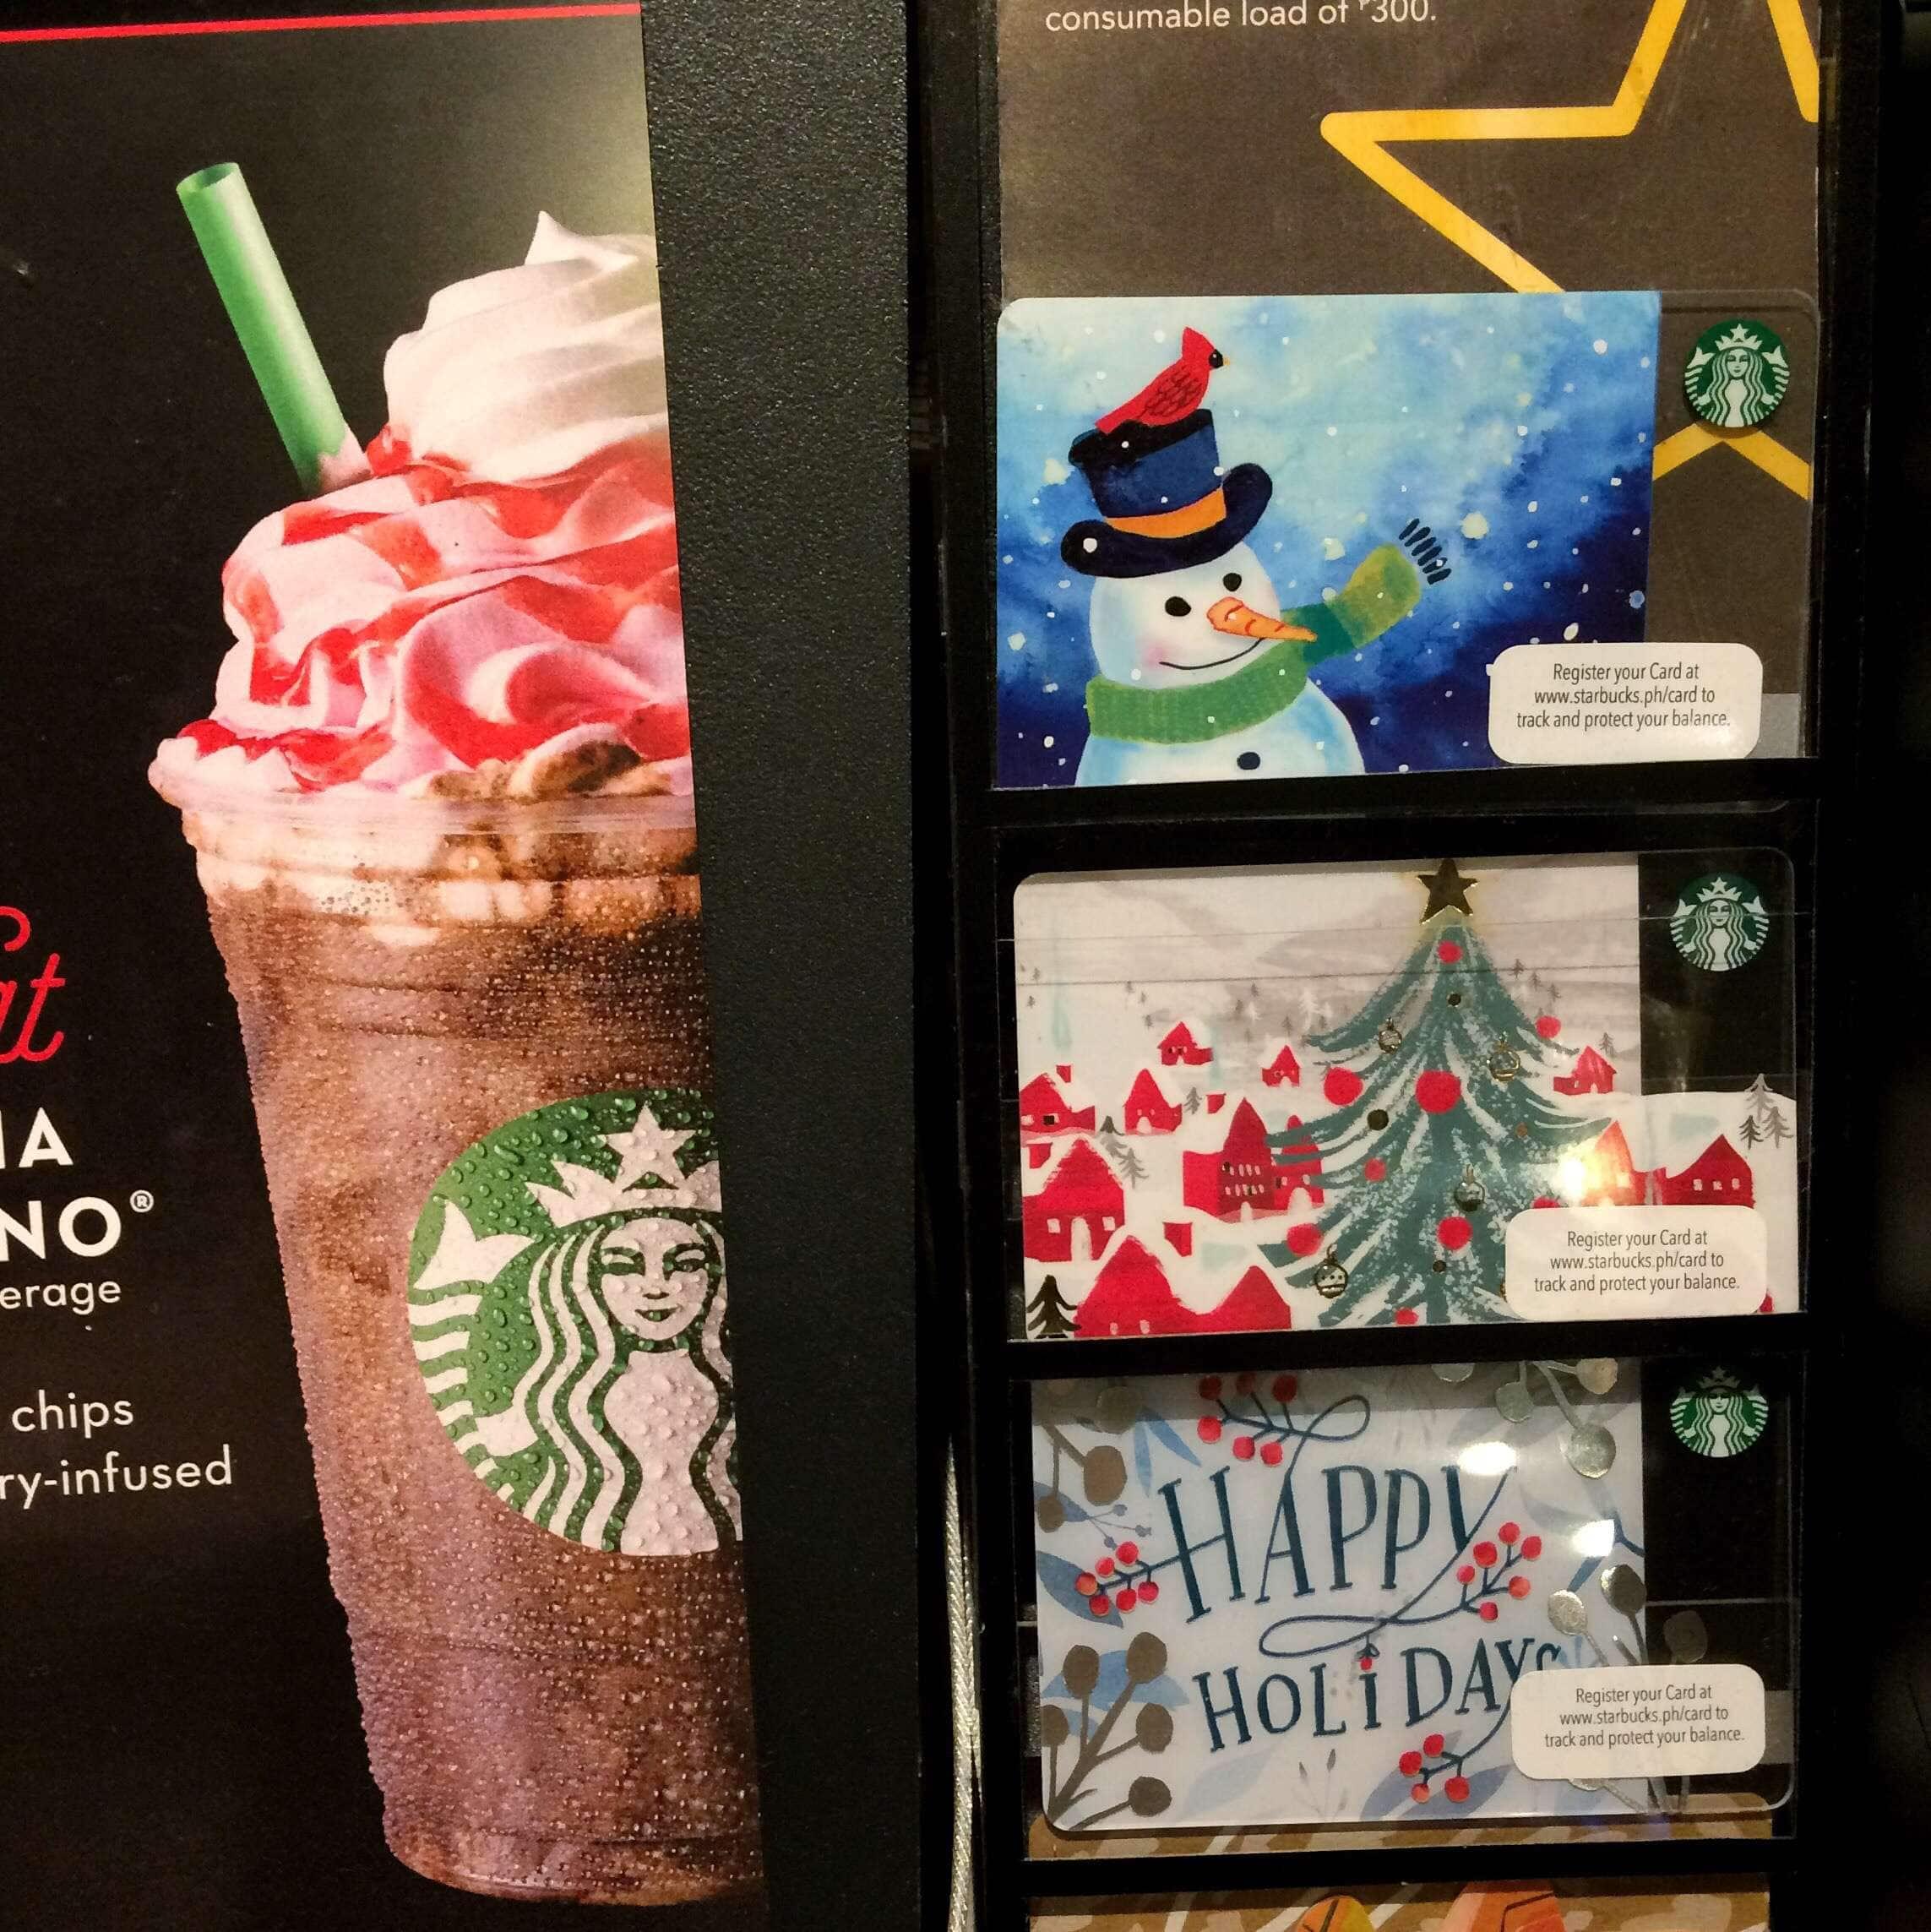 Foodfanaticph's review for Starbucks, Don Jose, Santa Rosa on Zomato